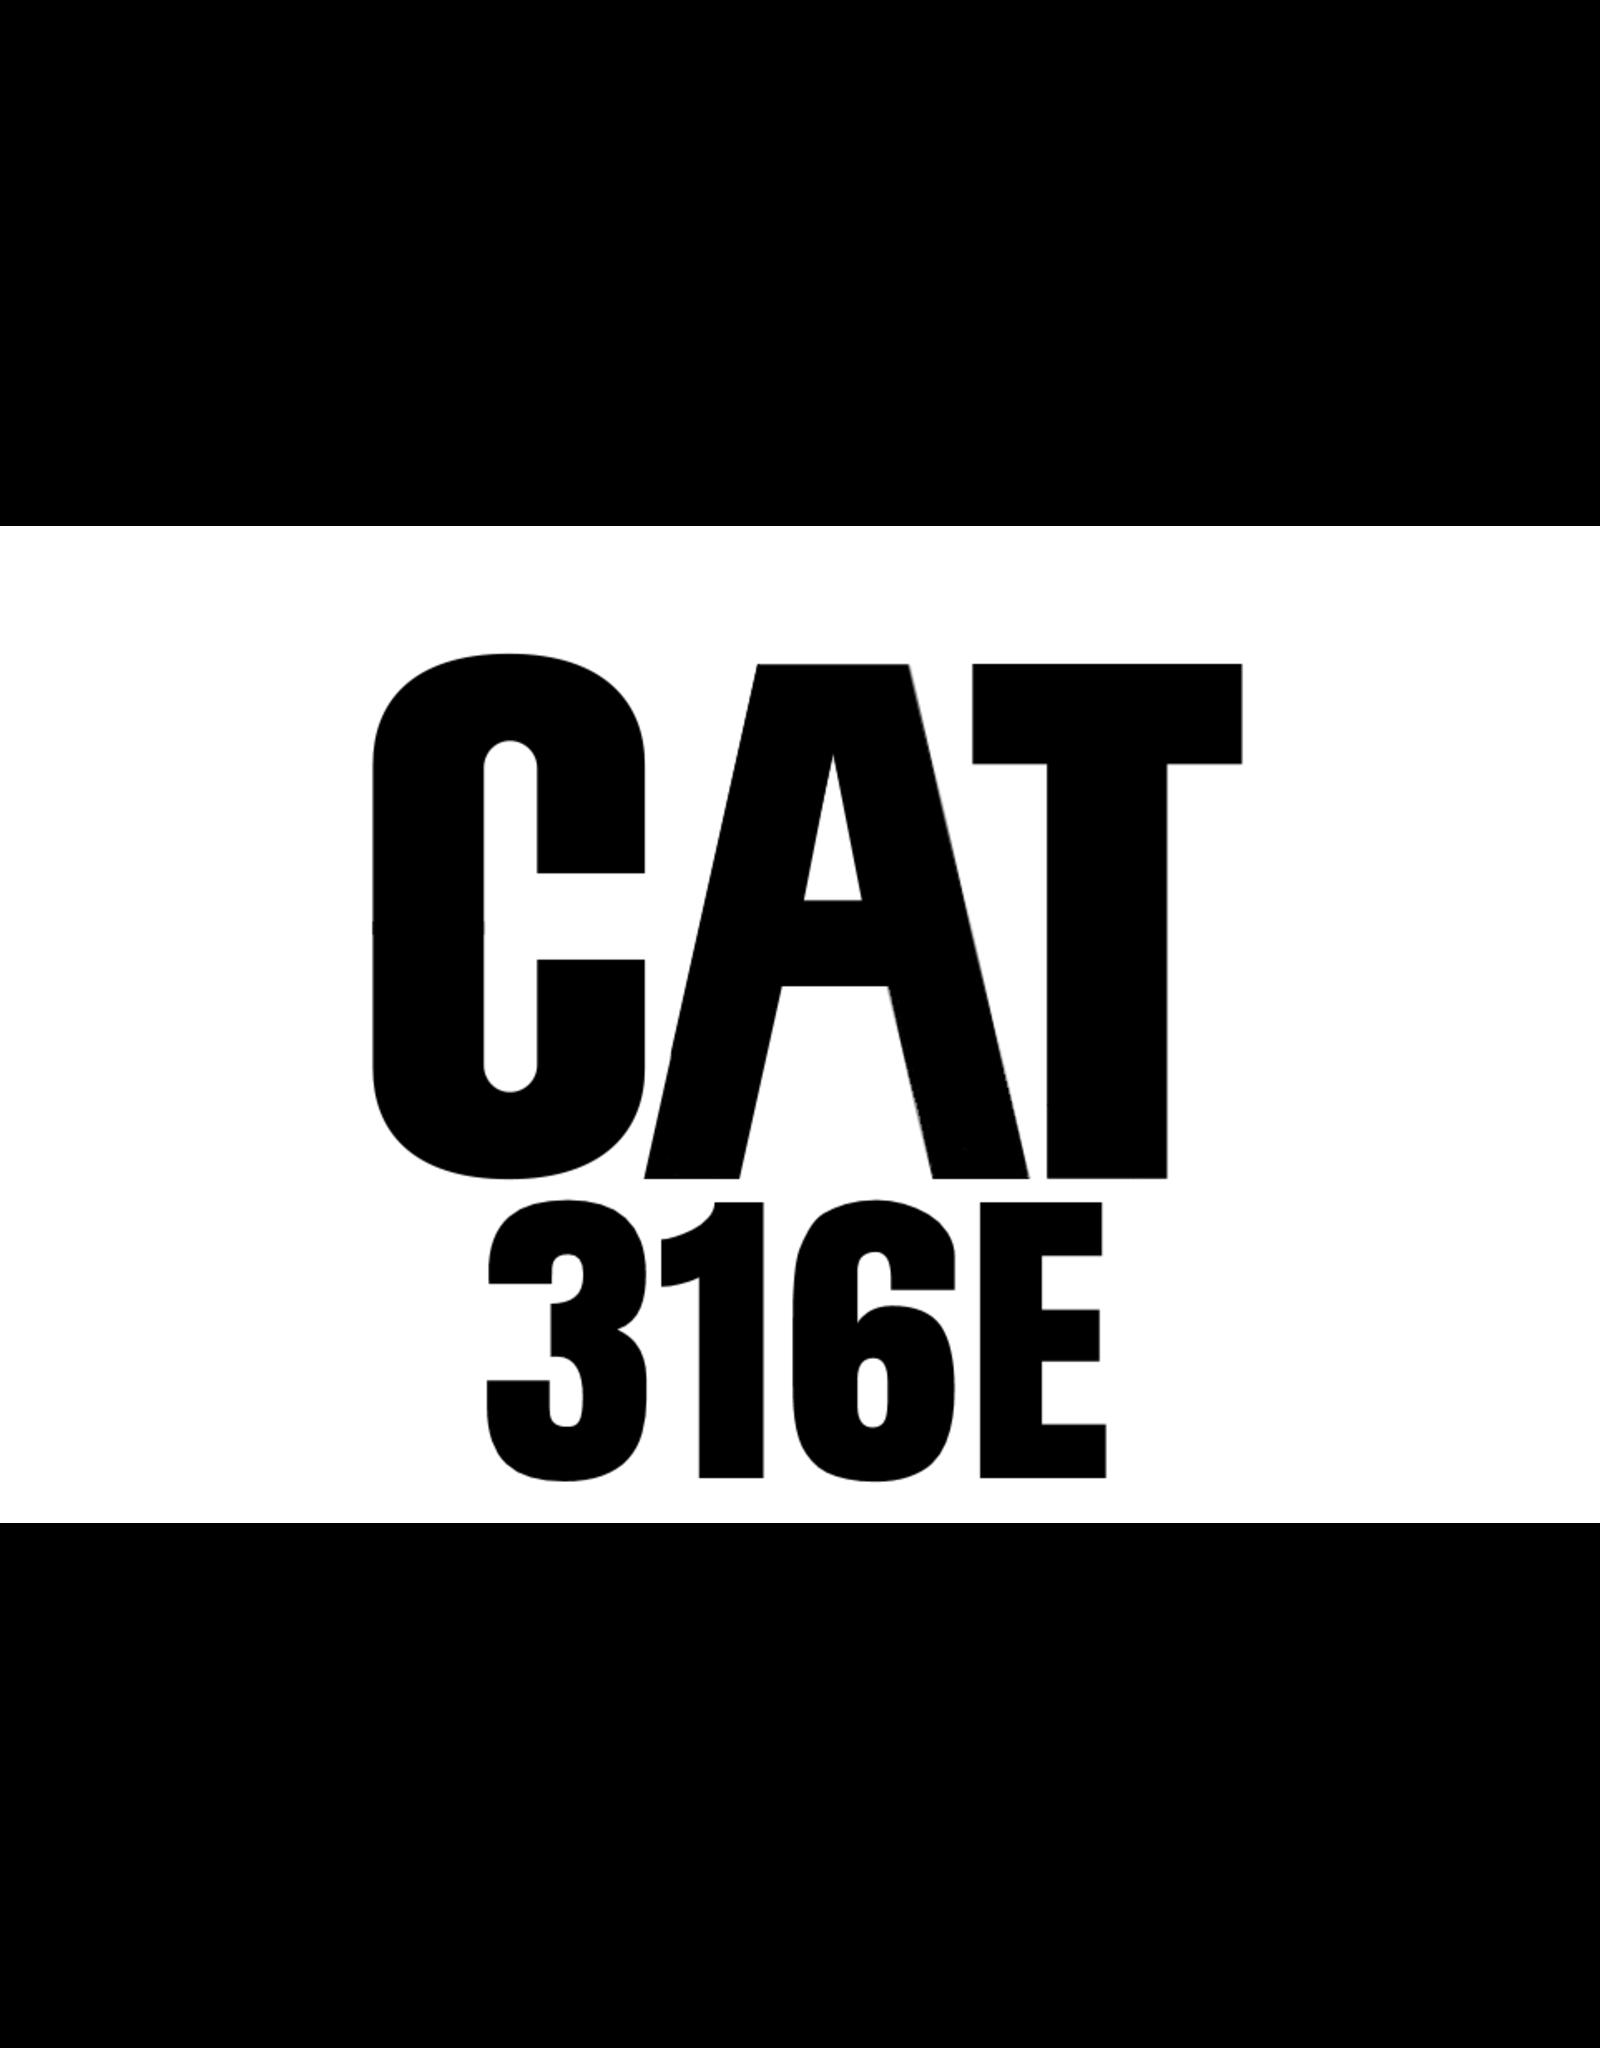 Echle Hartstahl GmbH FOPS für CAT 316E